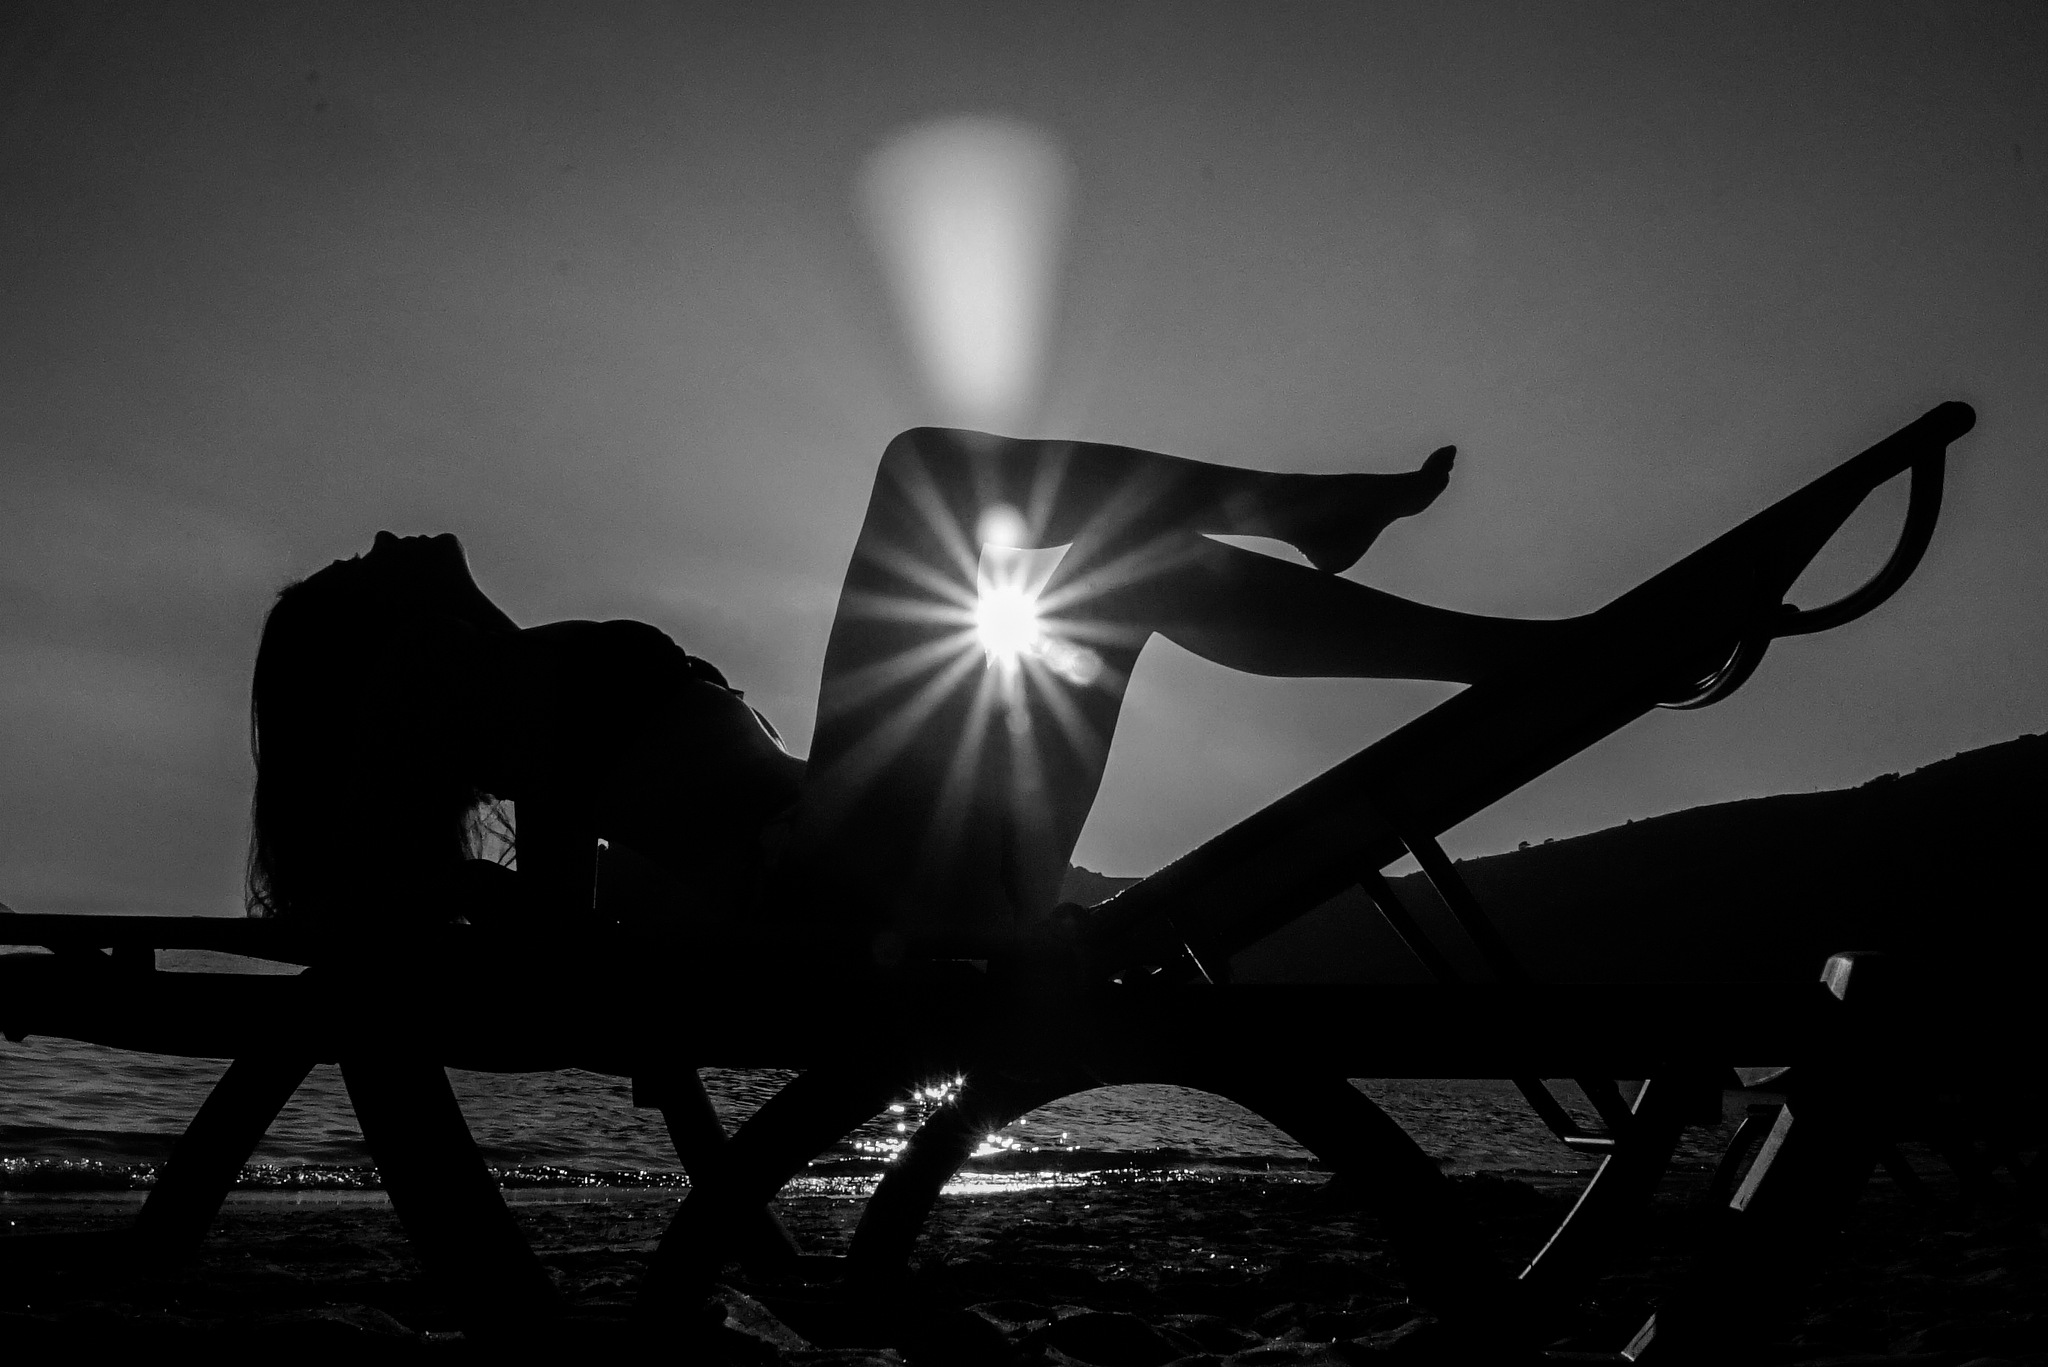 The breeze by Govoi Govoi